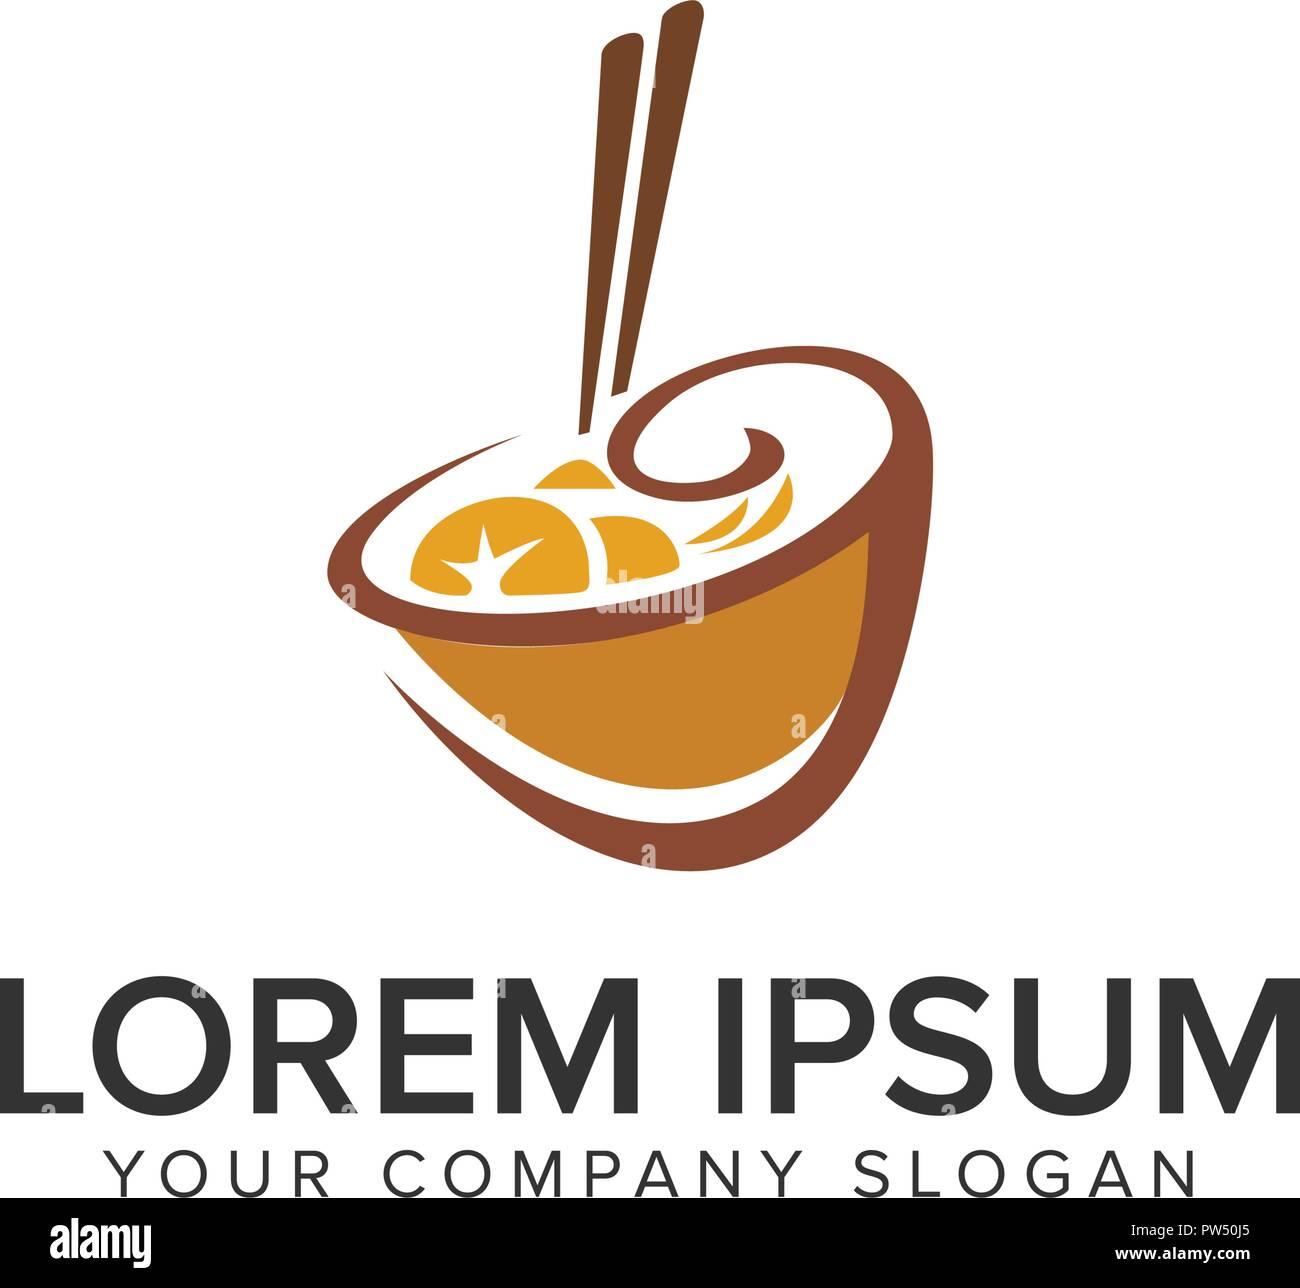 orange fruit drink logo design concept template fully editable